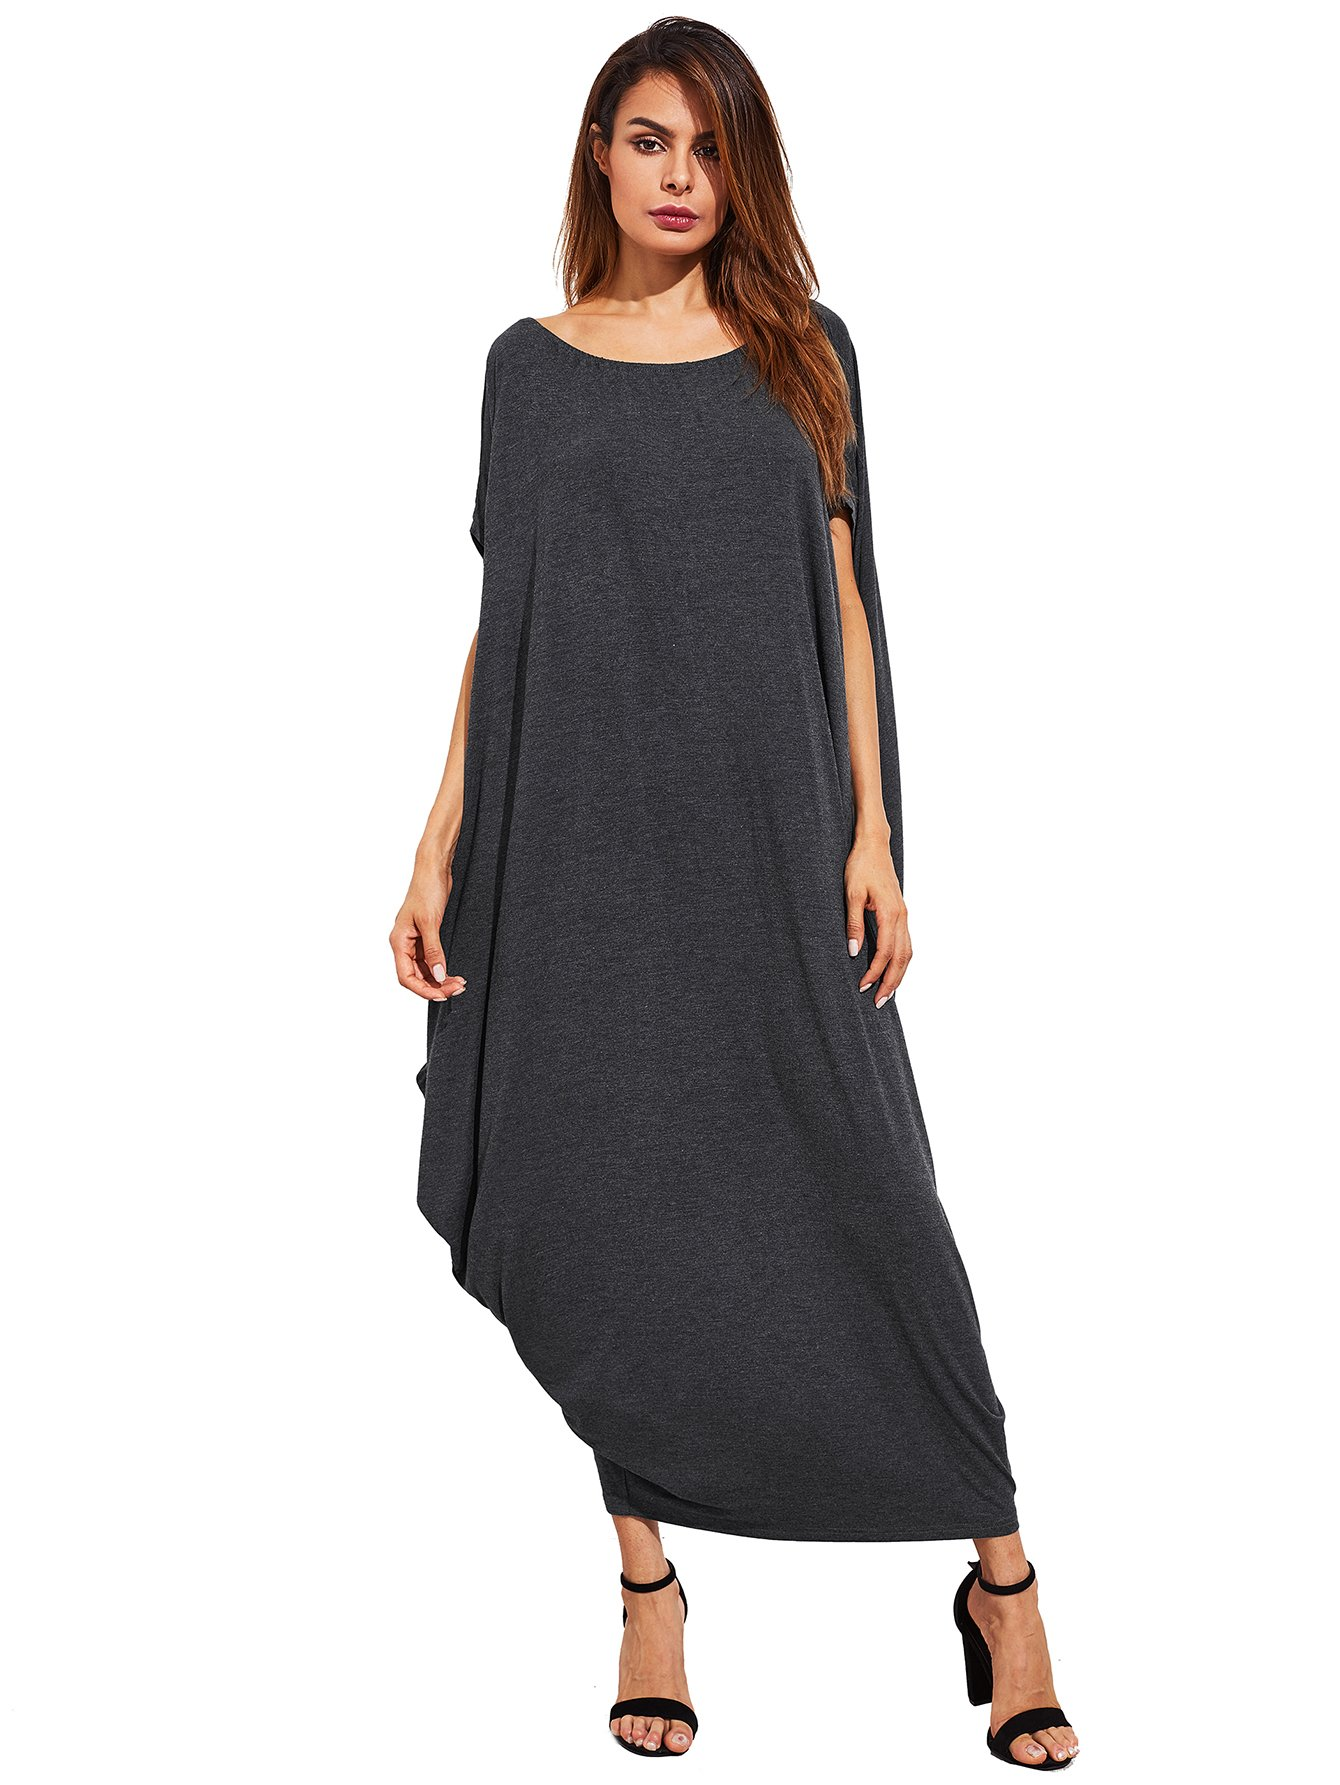 988caae3031 Galleon - Verdusa Women s Boho One Off Shoulder Caftan Sleeve Harem Maxi  Dress Dark Grey M